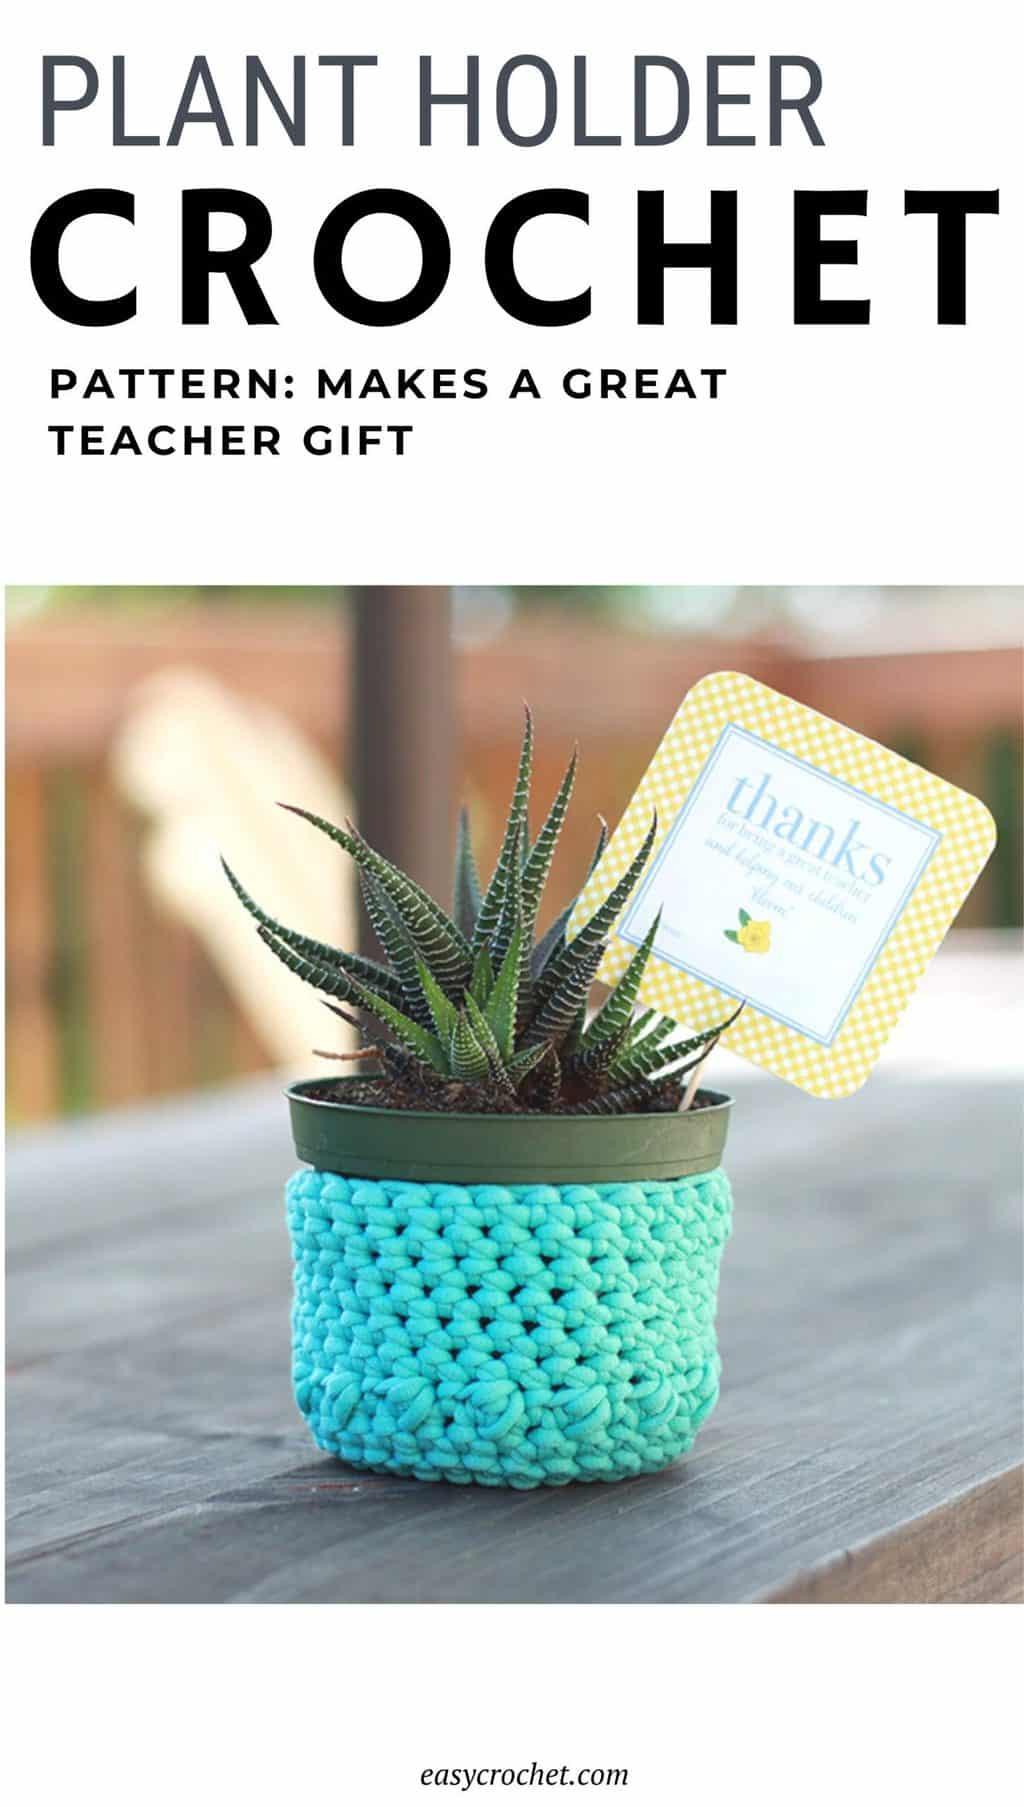 crocheted plant holder pattern